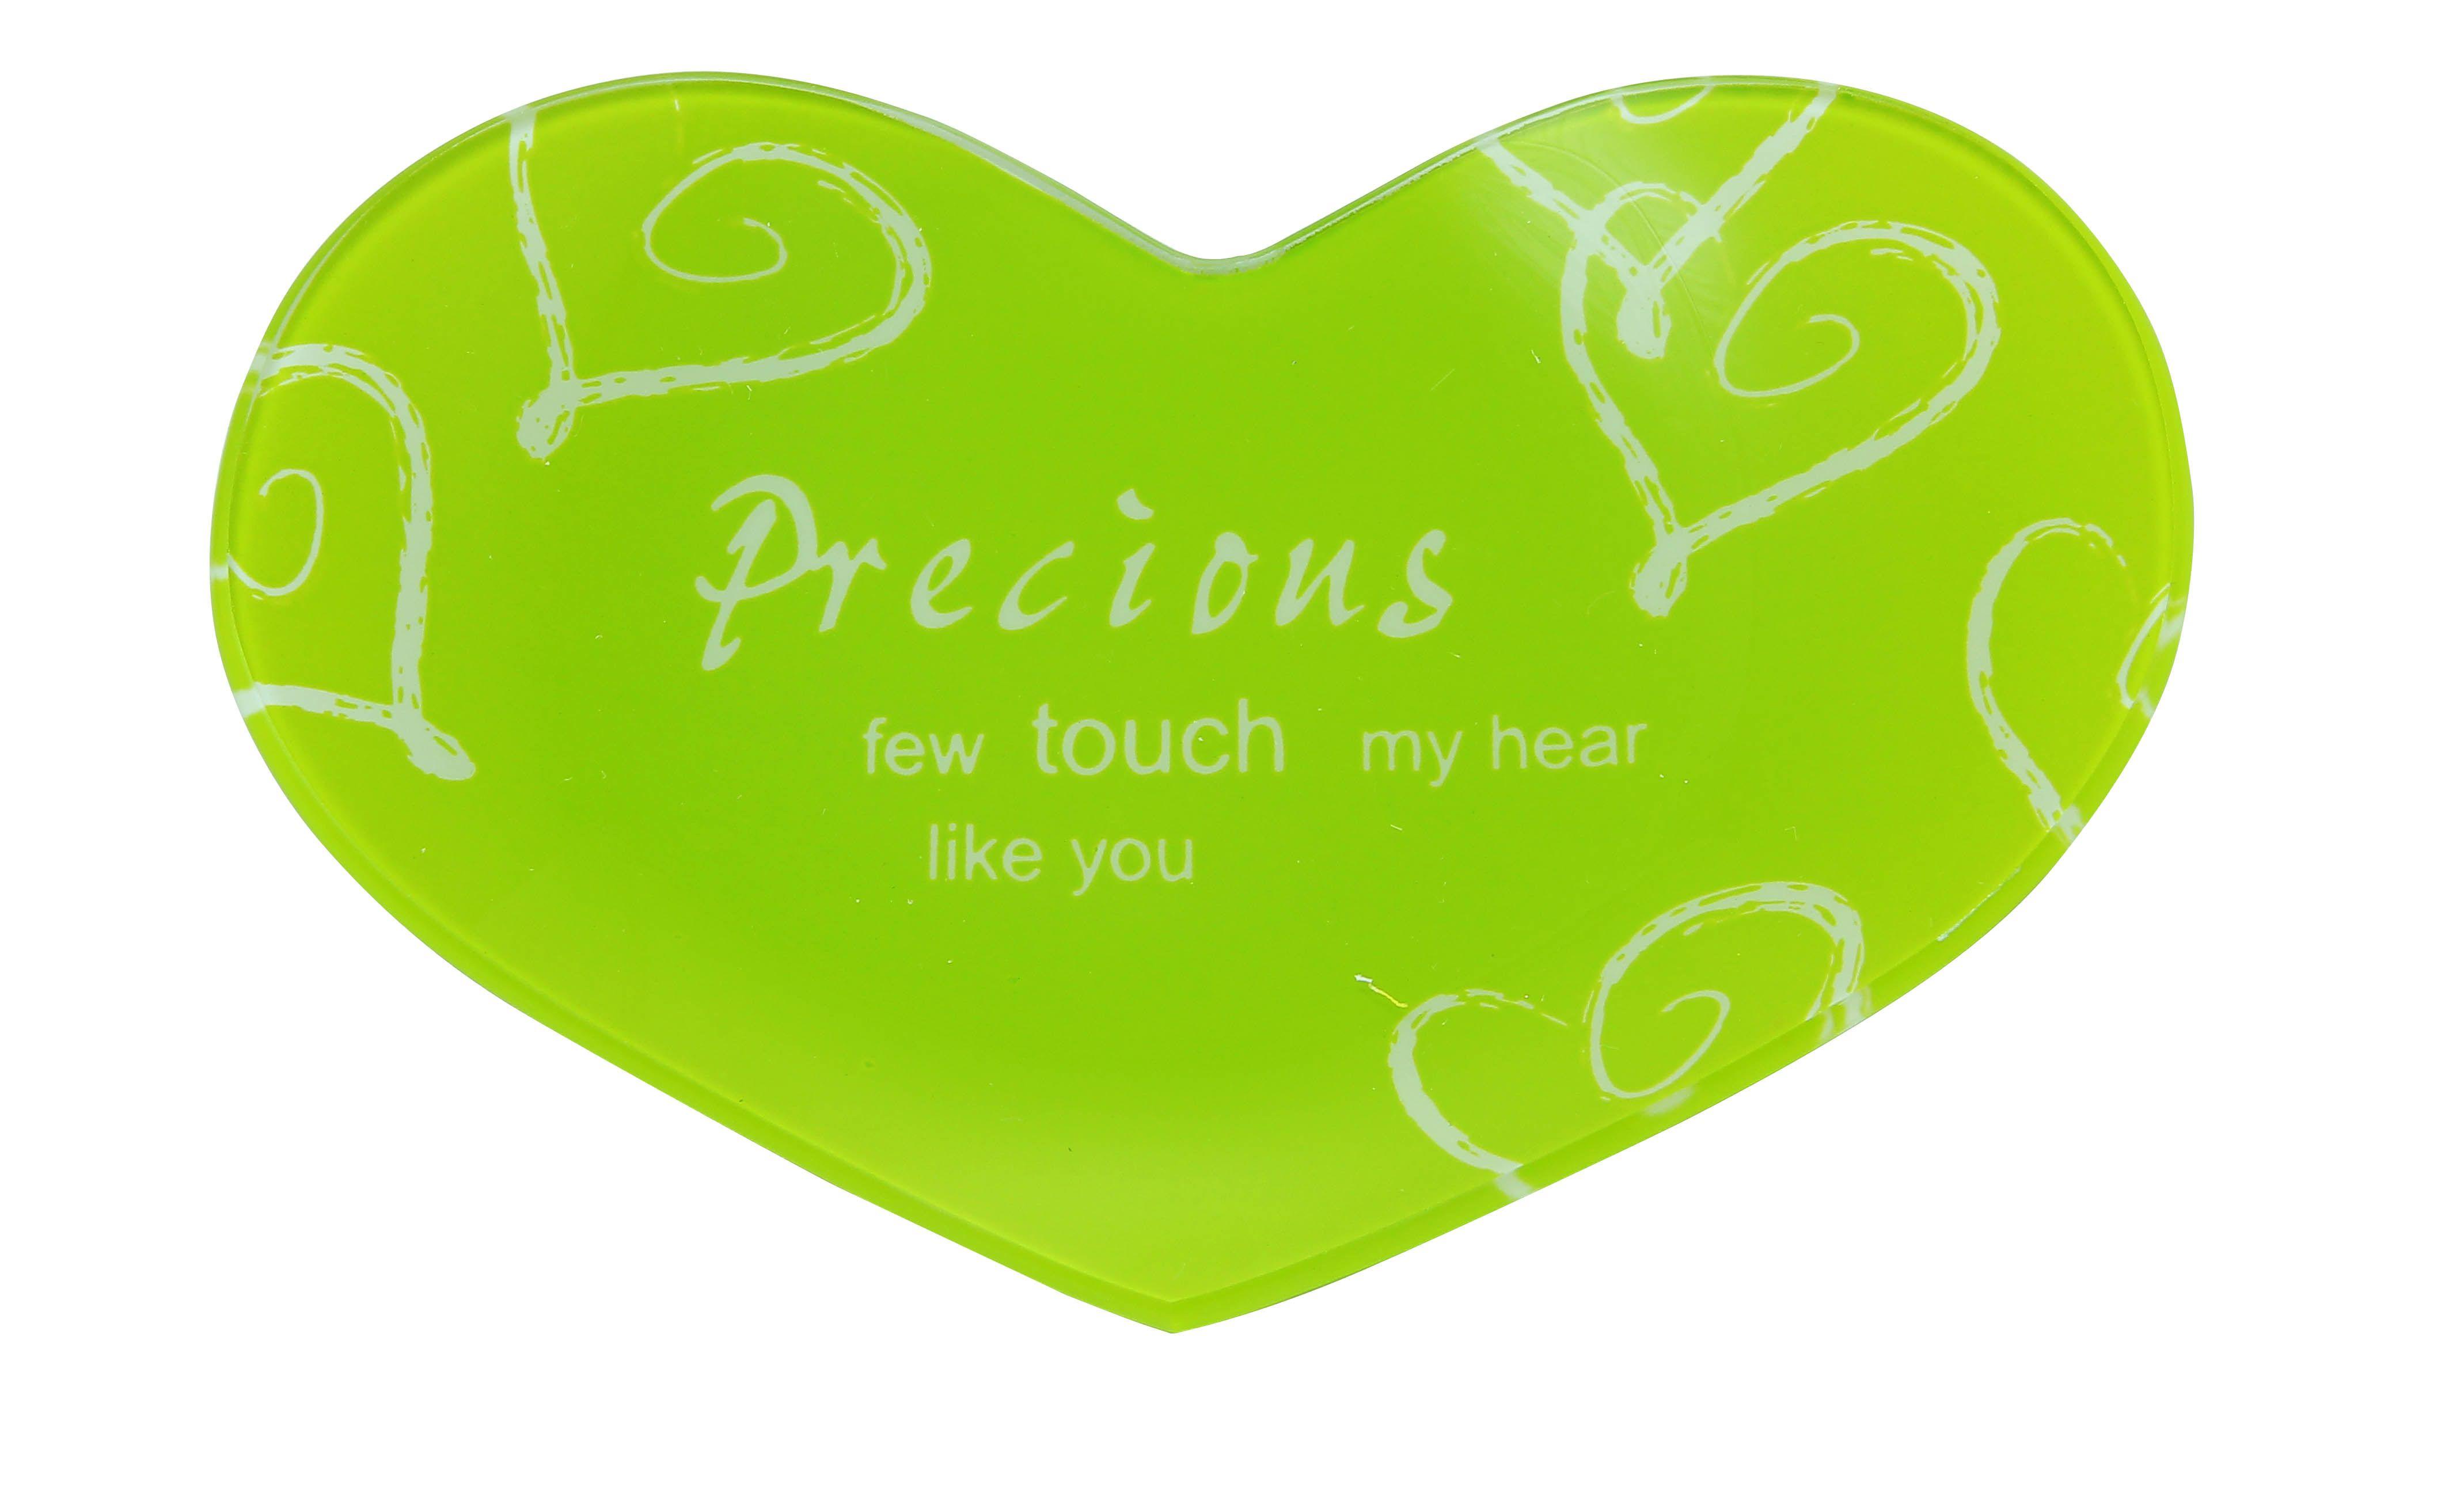 Precious few touch my heart like you